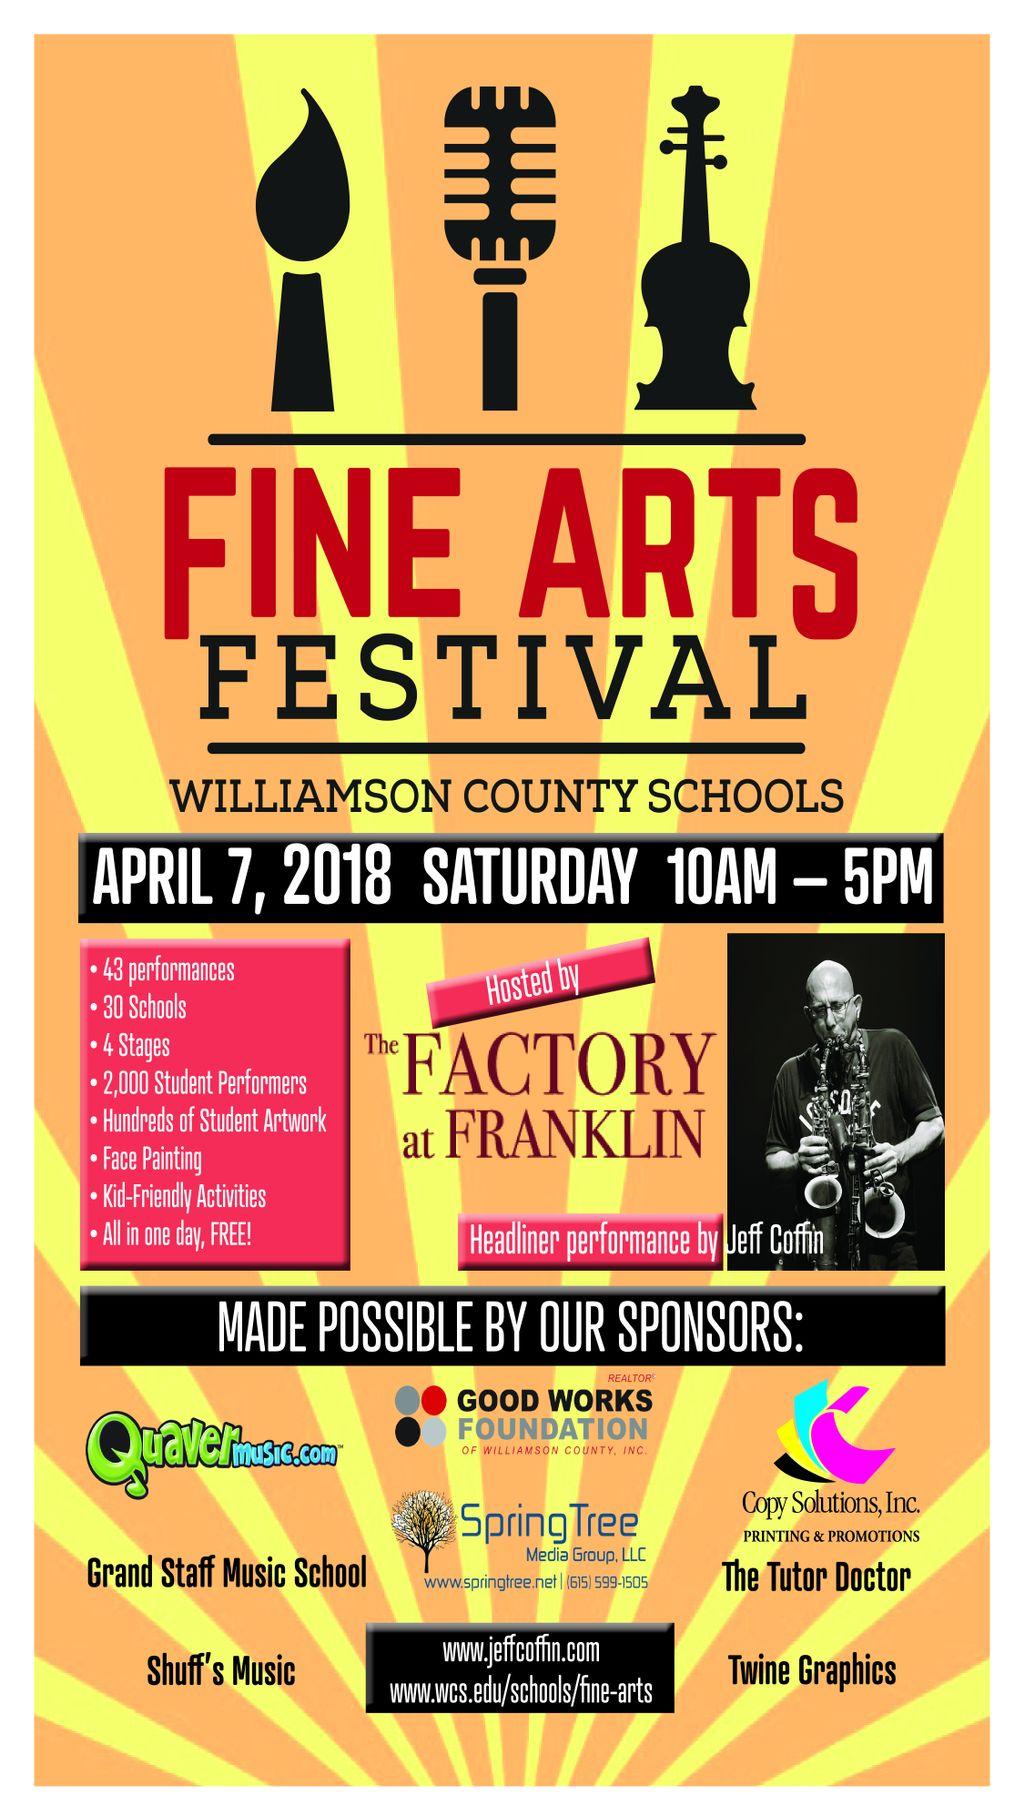 Williamson County Schools Event Flyer